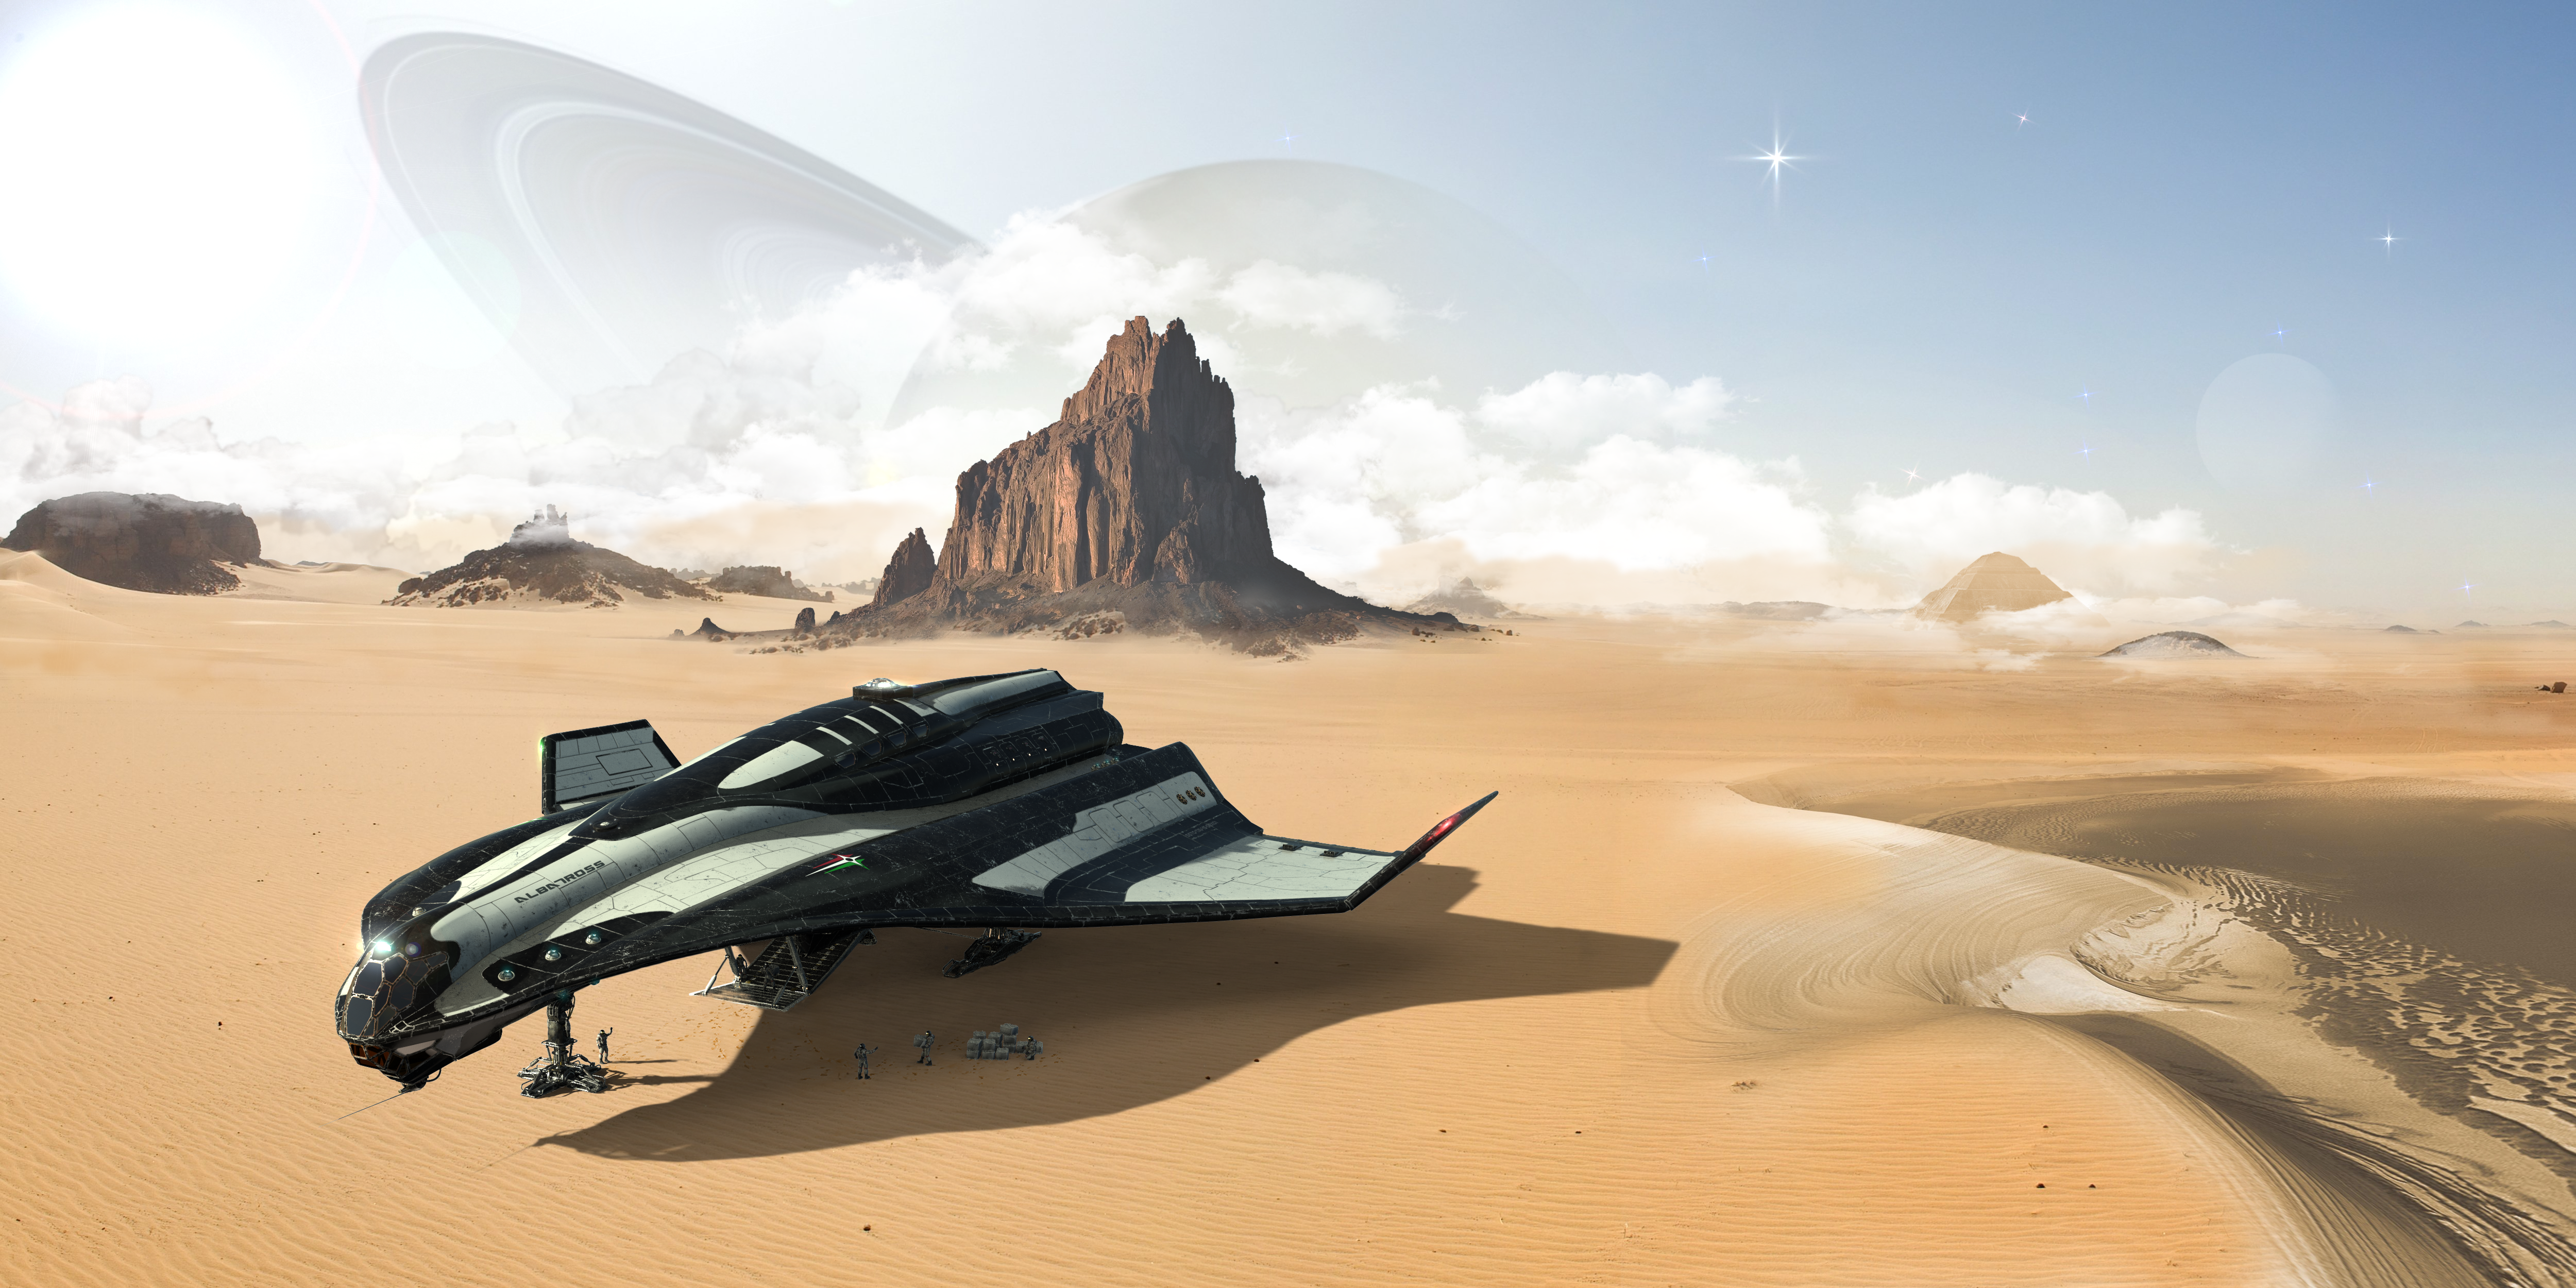 the_alenia_aerospace_albatross_class_by_